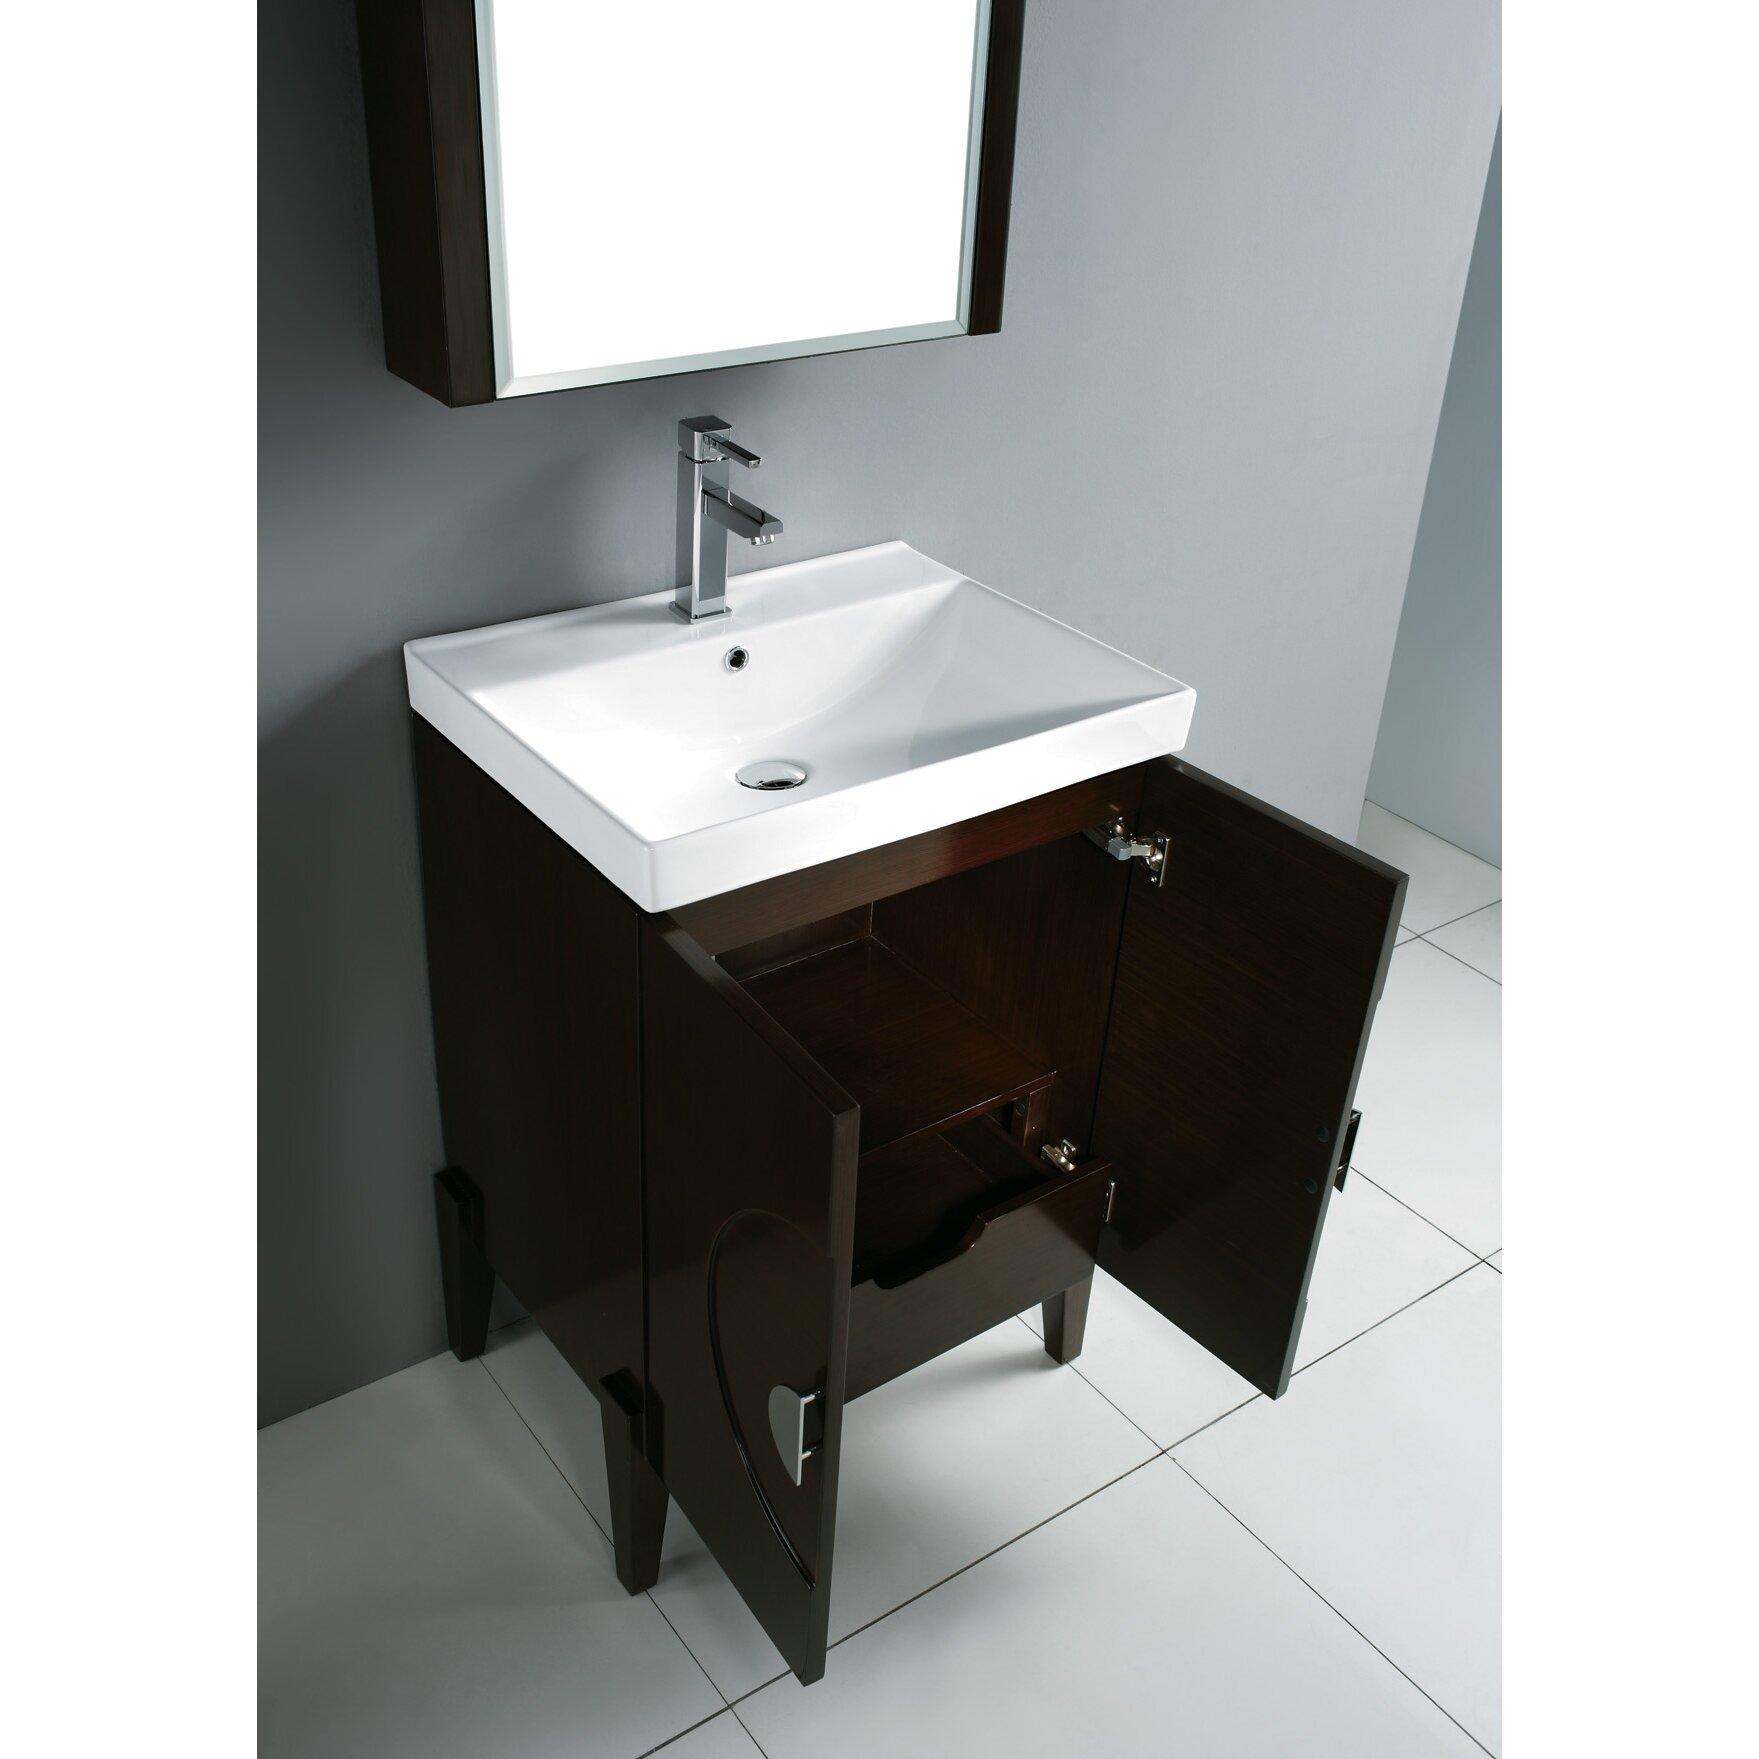 Bathroom Vanity Base Madeli Genova 24 Wall Mount Bathroom Vanity Base Reviews Wayfair